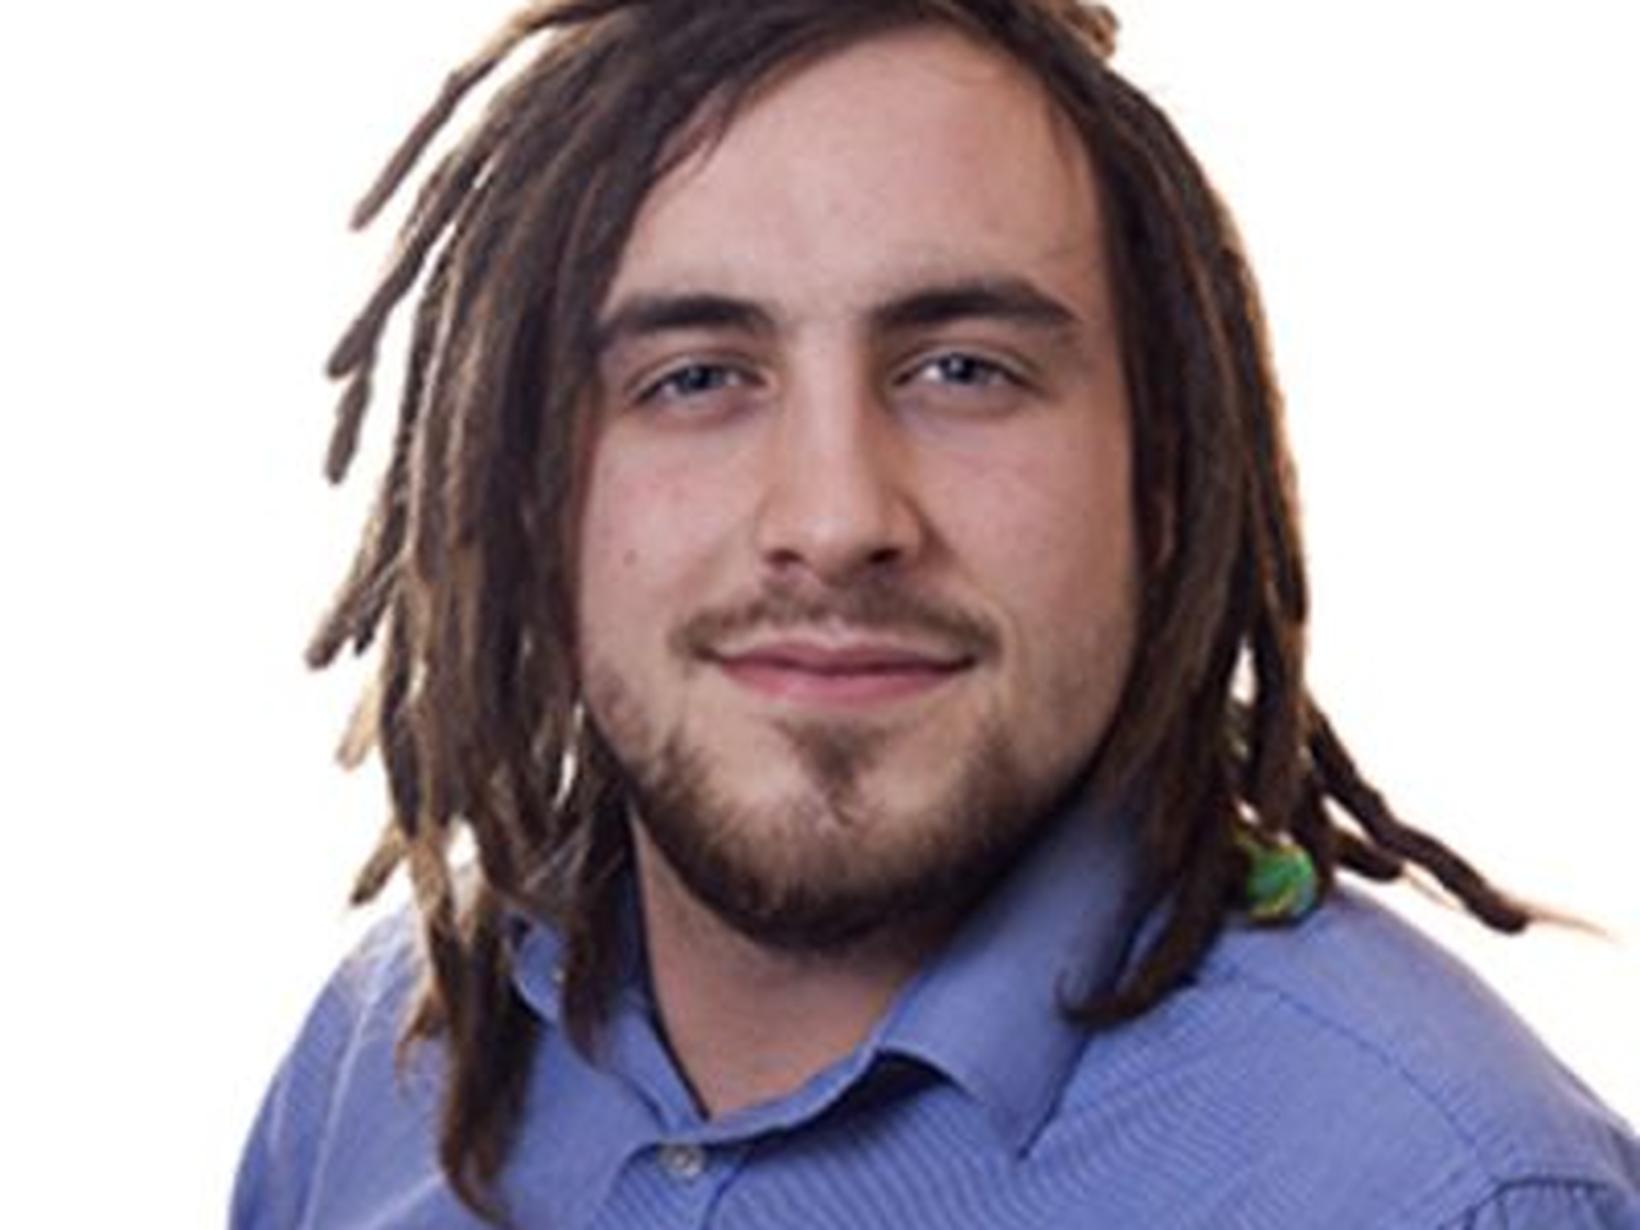 James from Cardiff, United Kingdom